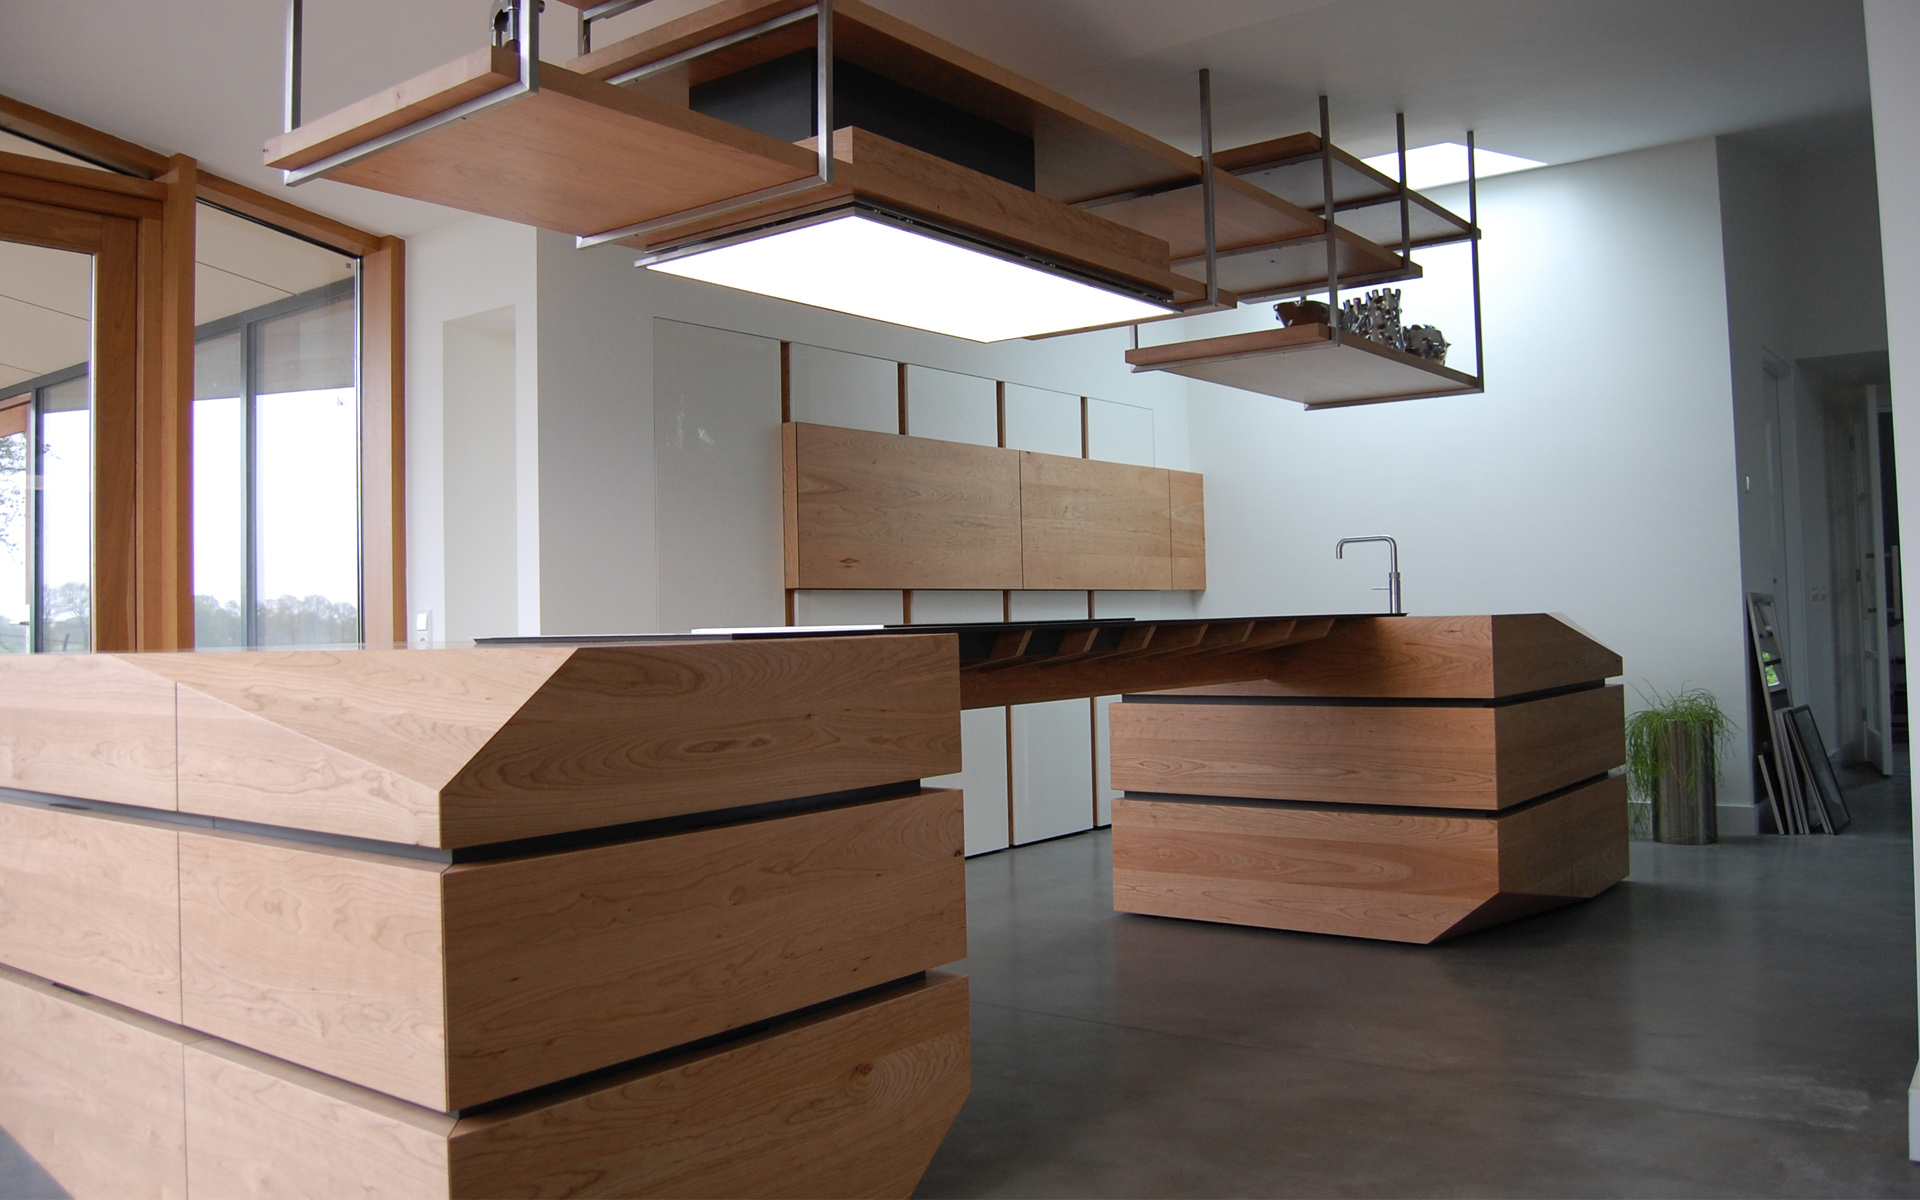 Keuken kersenhout studio sool